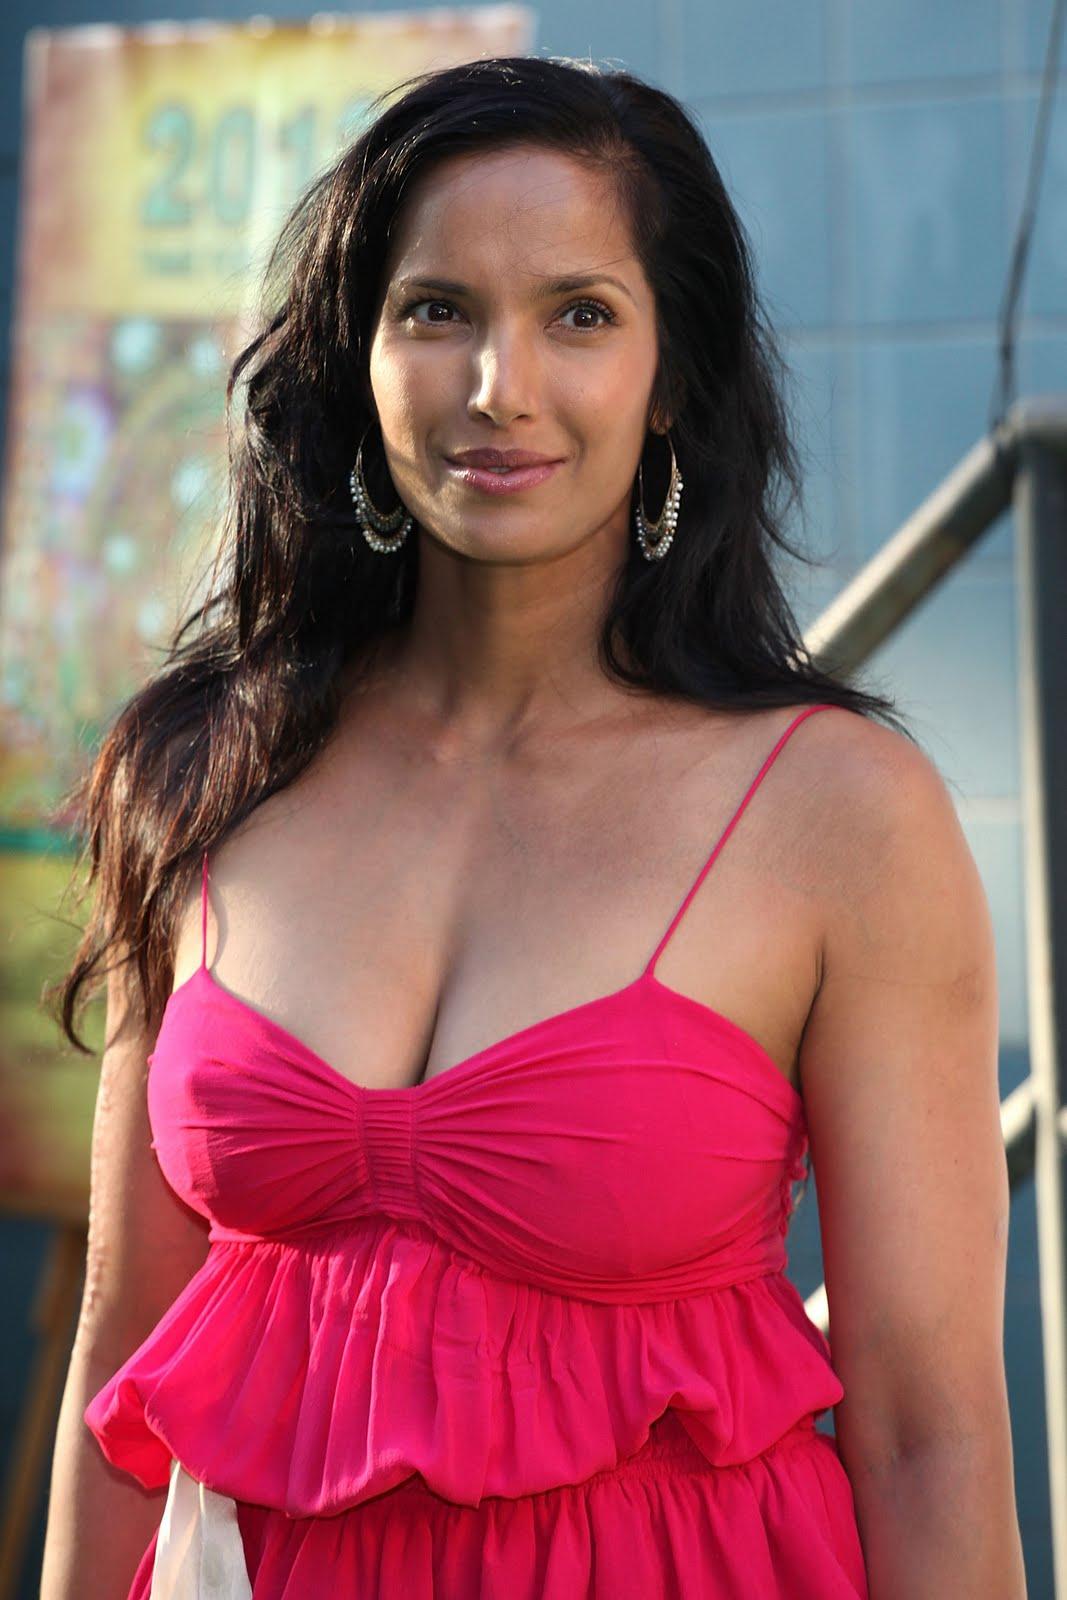 Pictures Patricia Velasquez nudes (24 photo), Ass, Is a cute, Instagram, underwear 2015